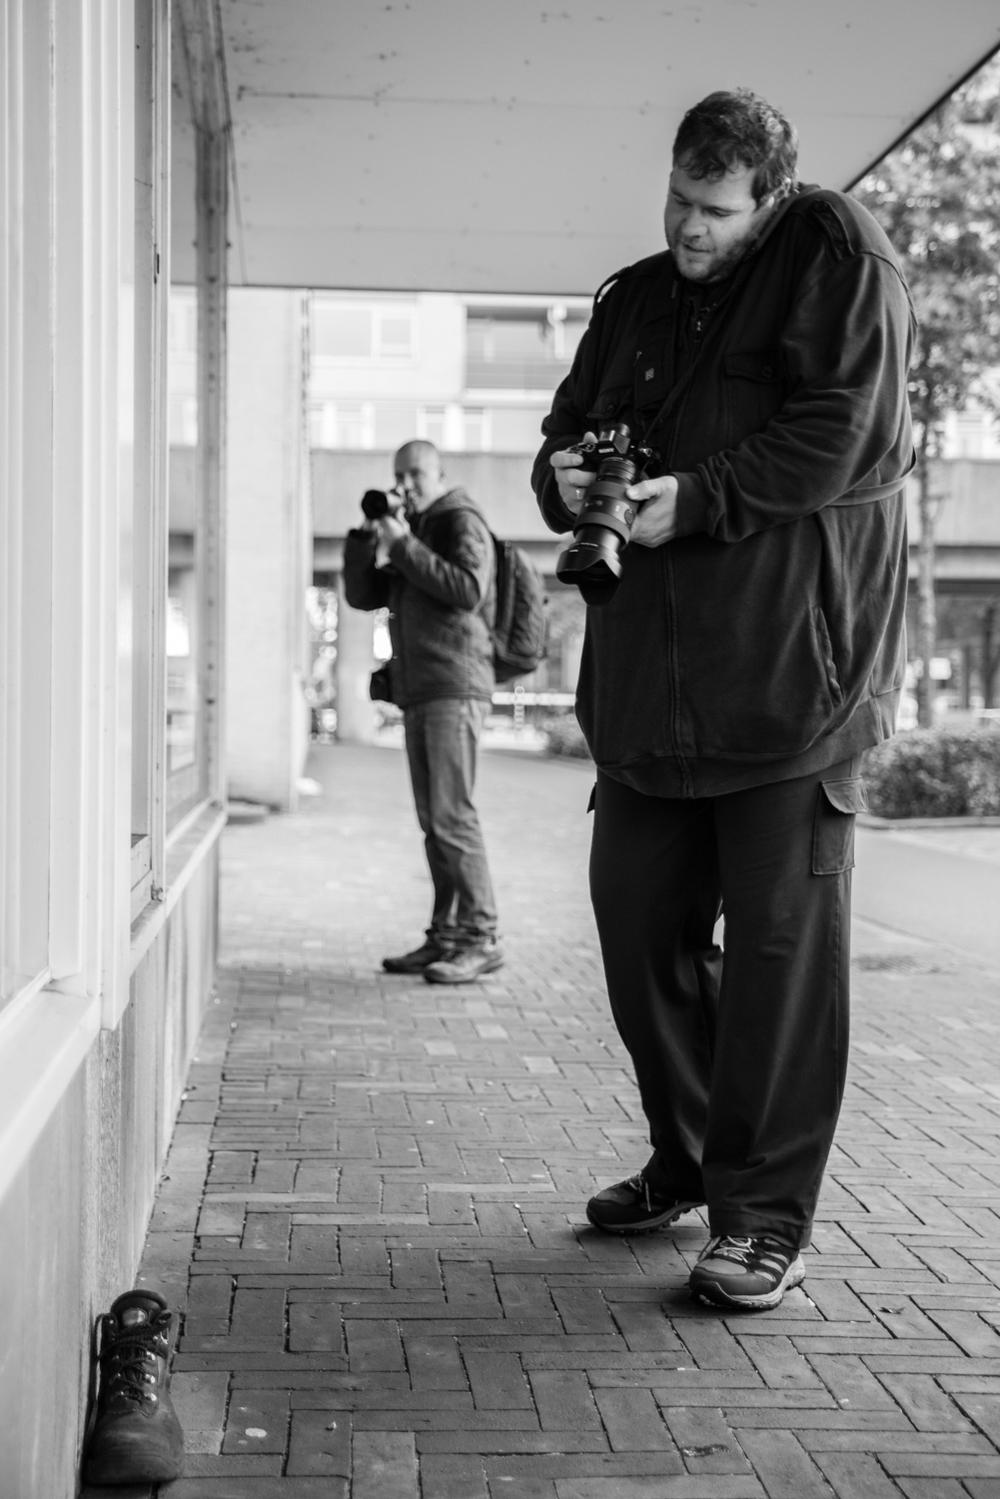 fotowalk_tilburg-22.jpg